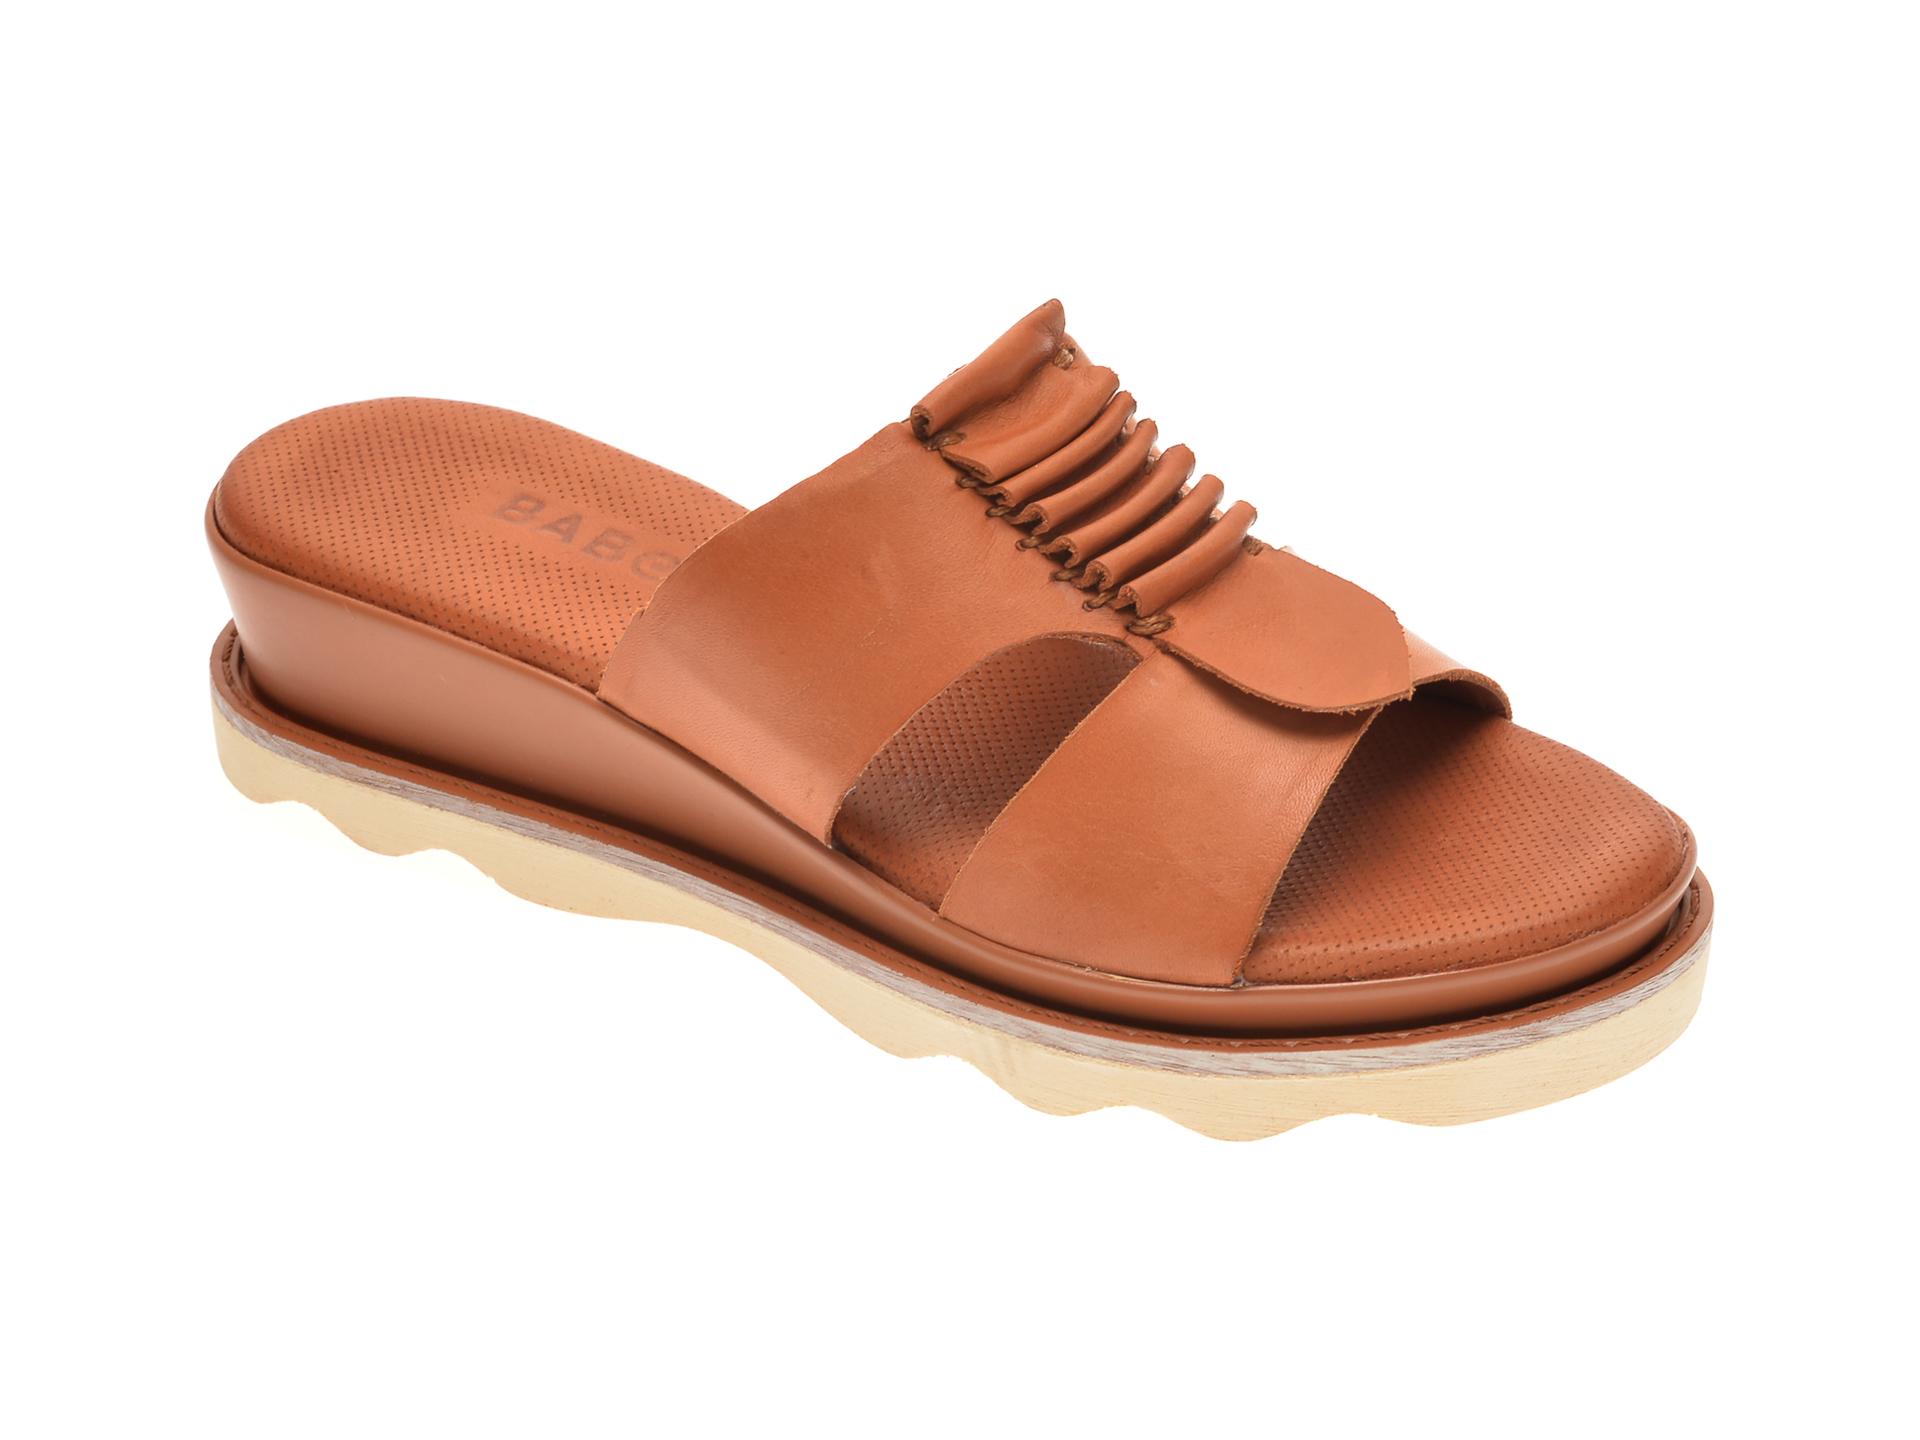 Papuci BABOOS maro, 0203, din piele naturala imagine